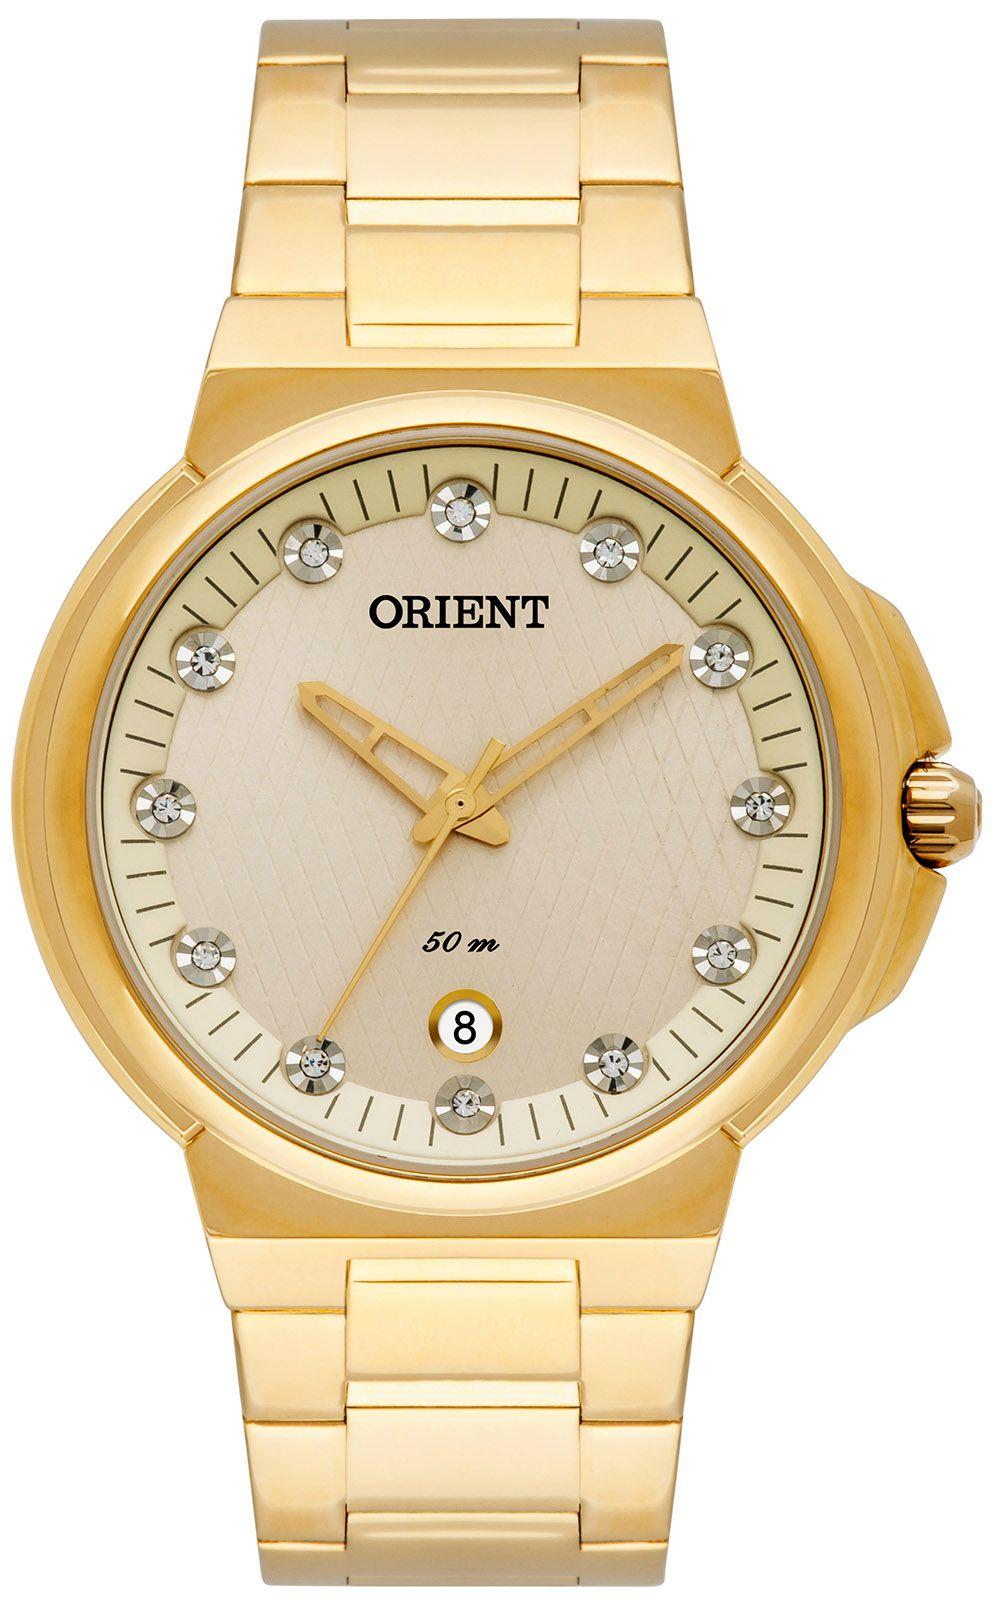 9bfc3e8bbf8 Relógio Orient Feminino FGSS1129-C1KX Dourado - PATRICIA JOIAS